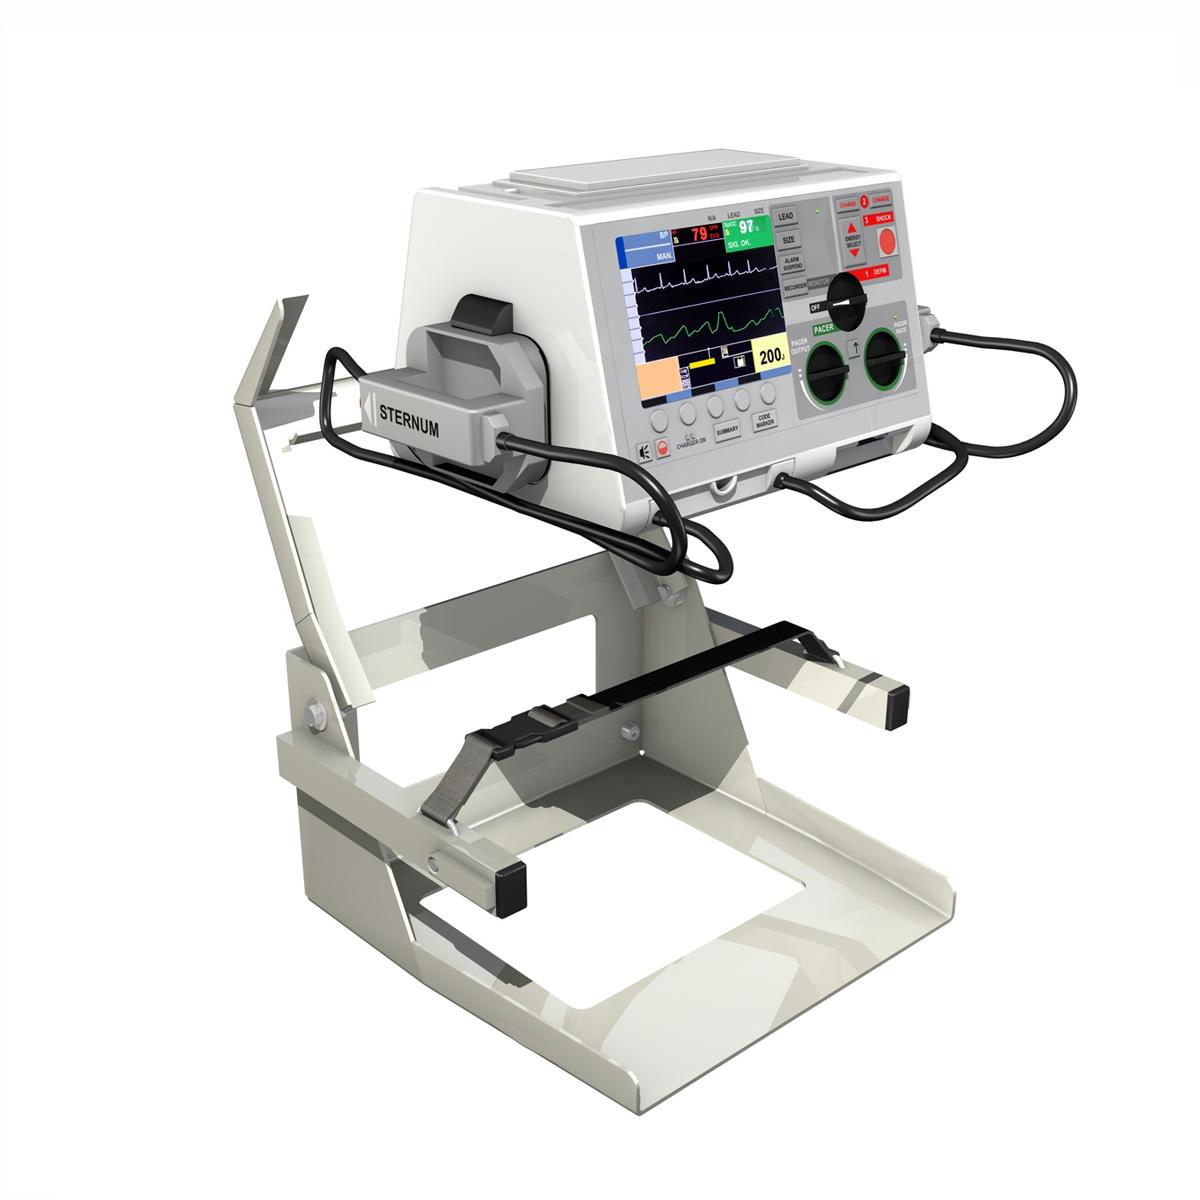 defibrillator 3d model 3ds c4d lwo obj 264213